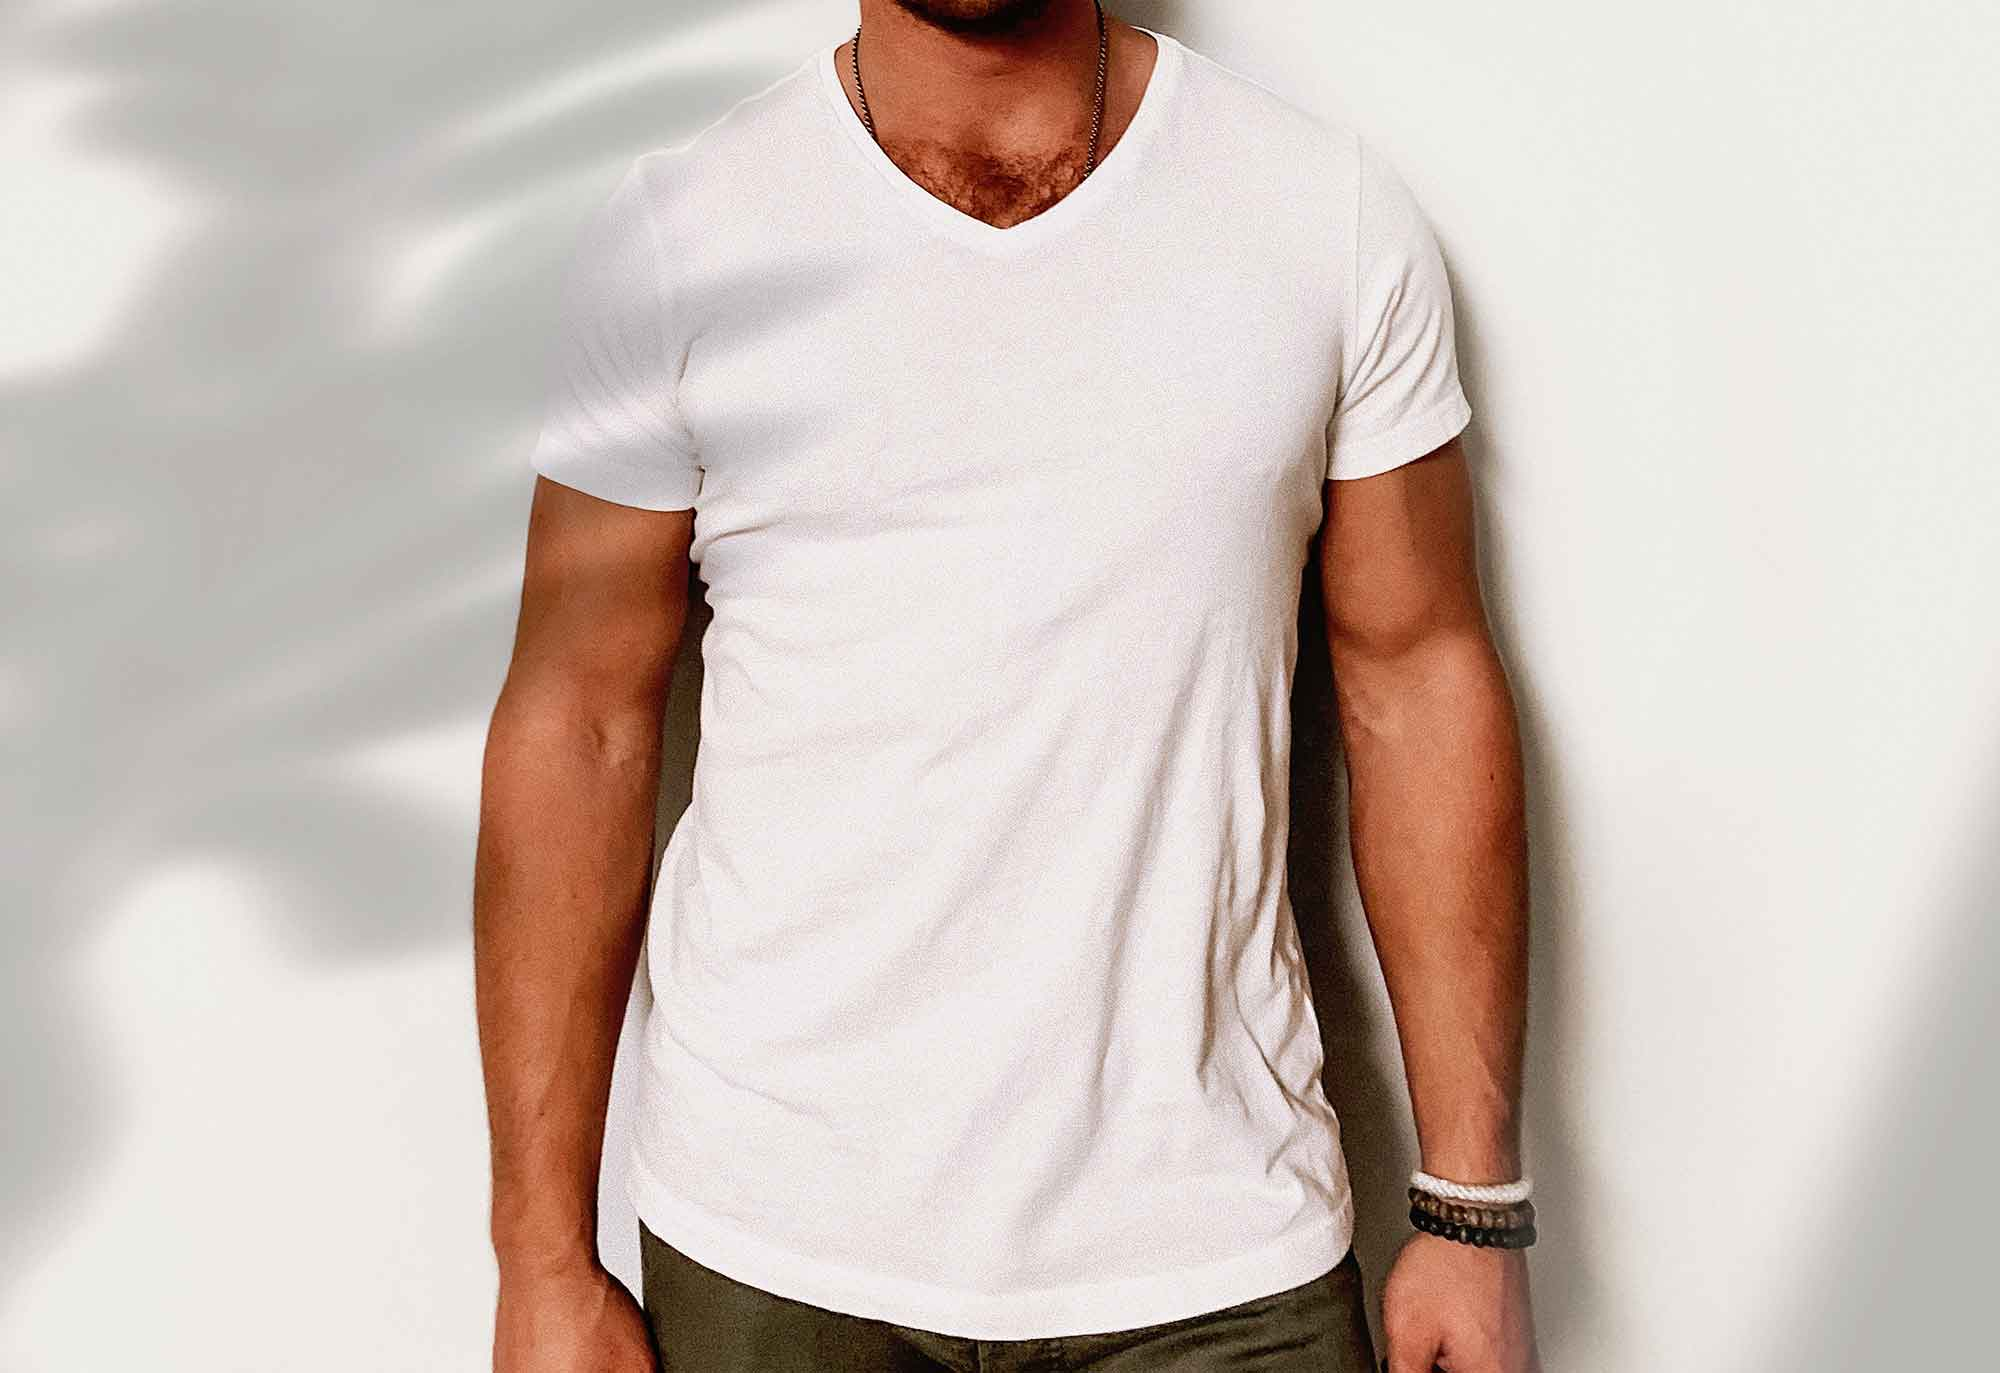 V Neck T-Shirt Mockup 2